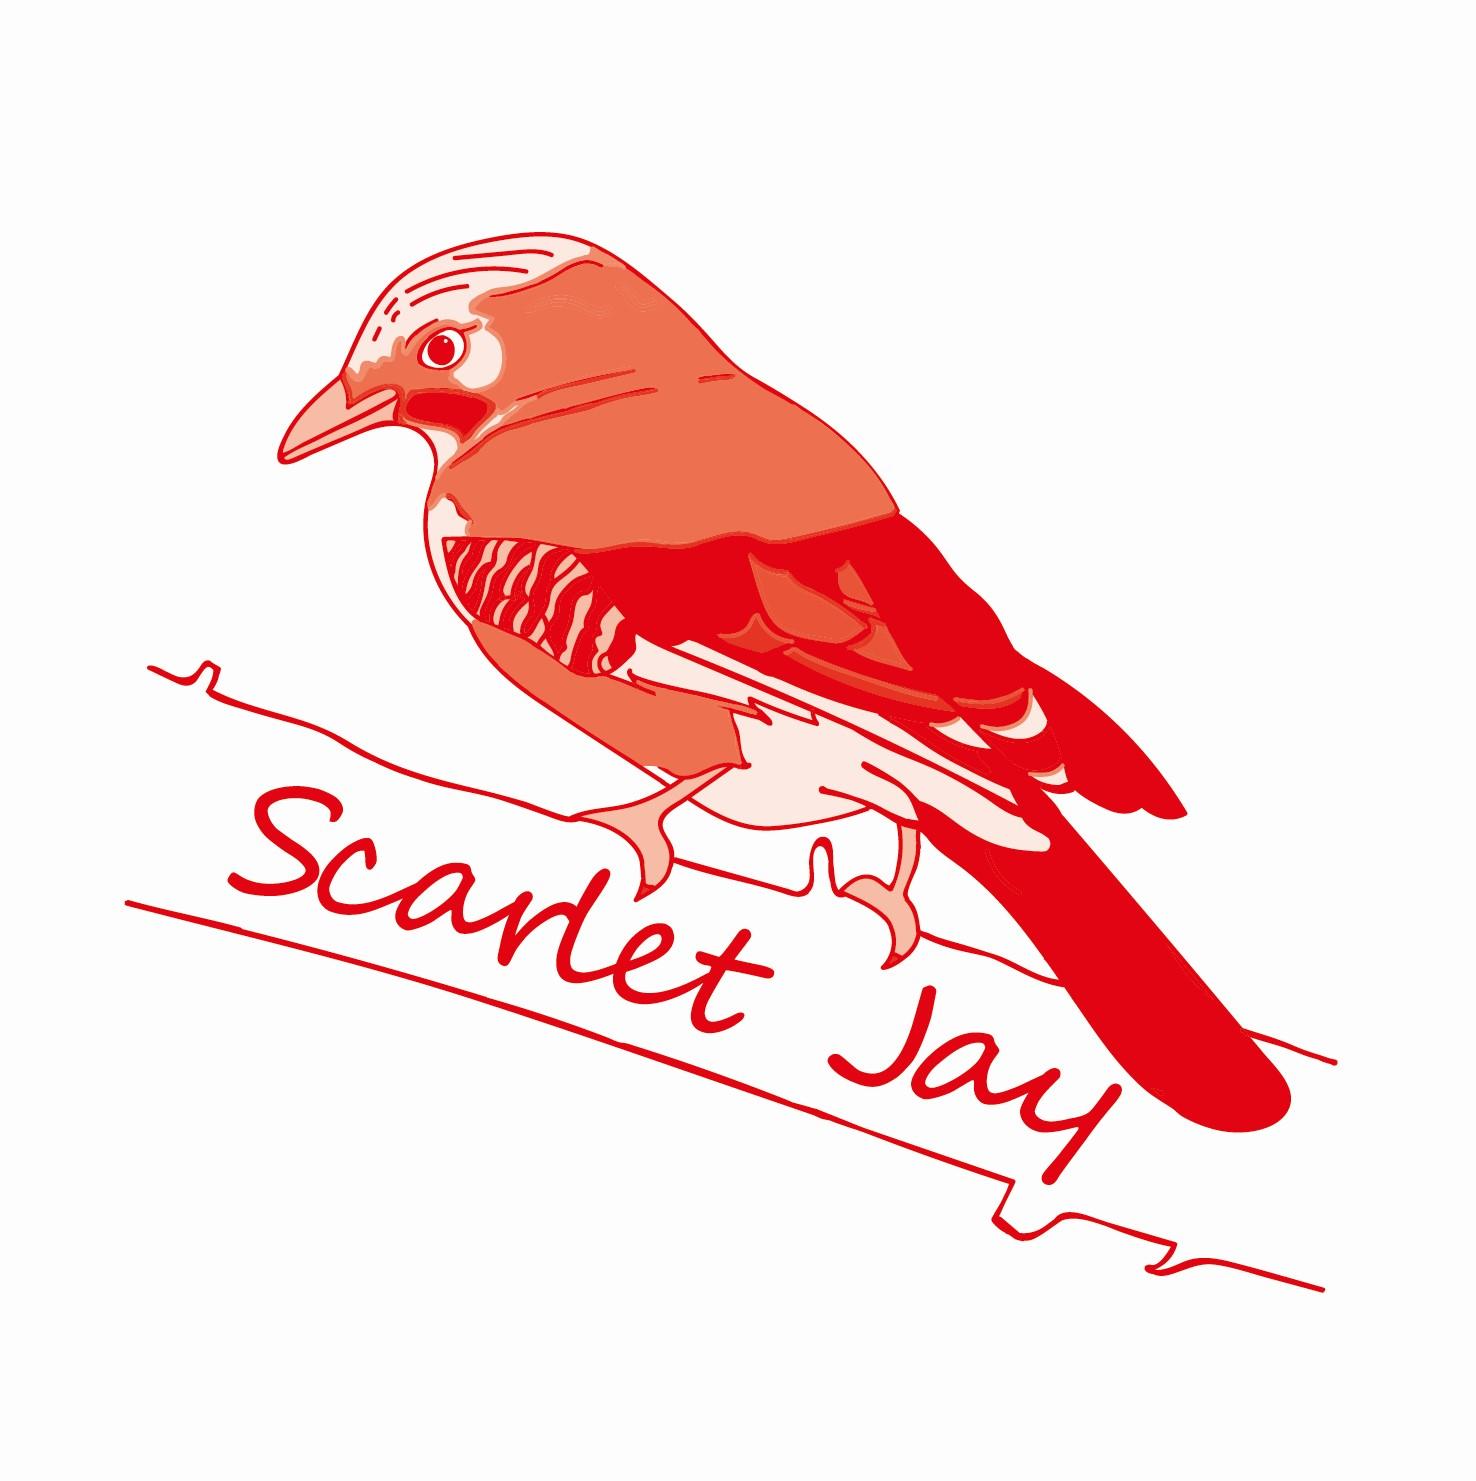 Scarlet Jay